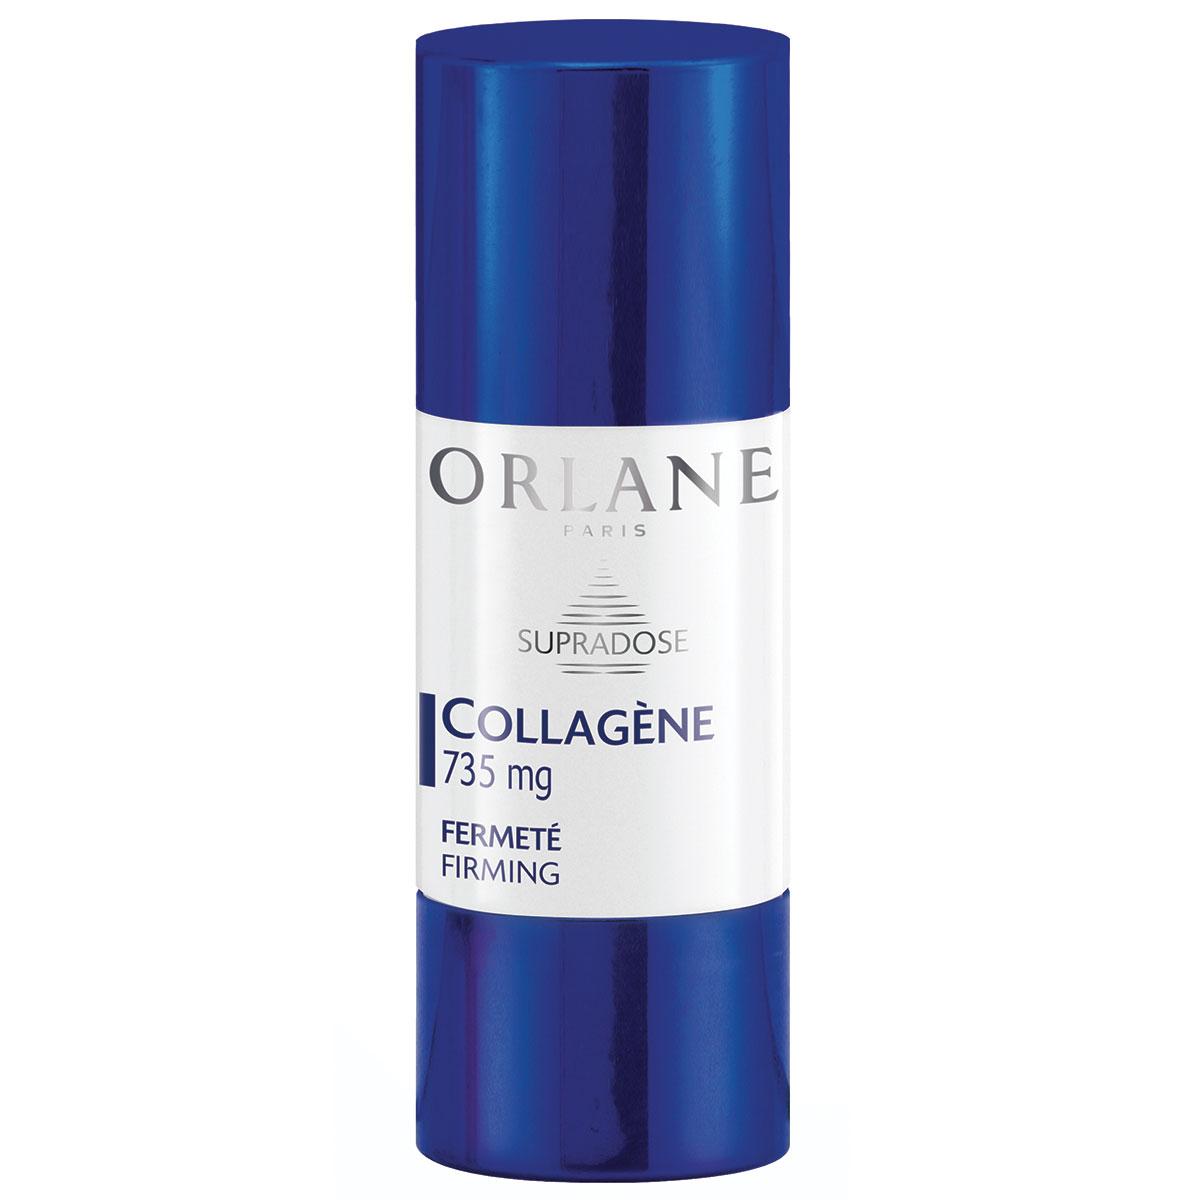 Supradose Concentré Collagène Fermeté - Orlane